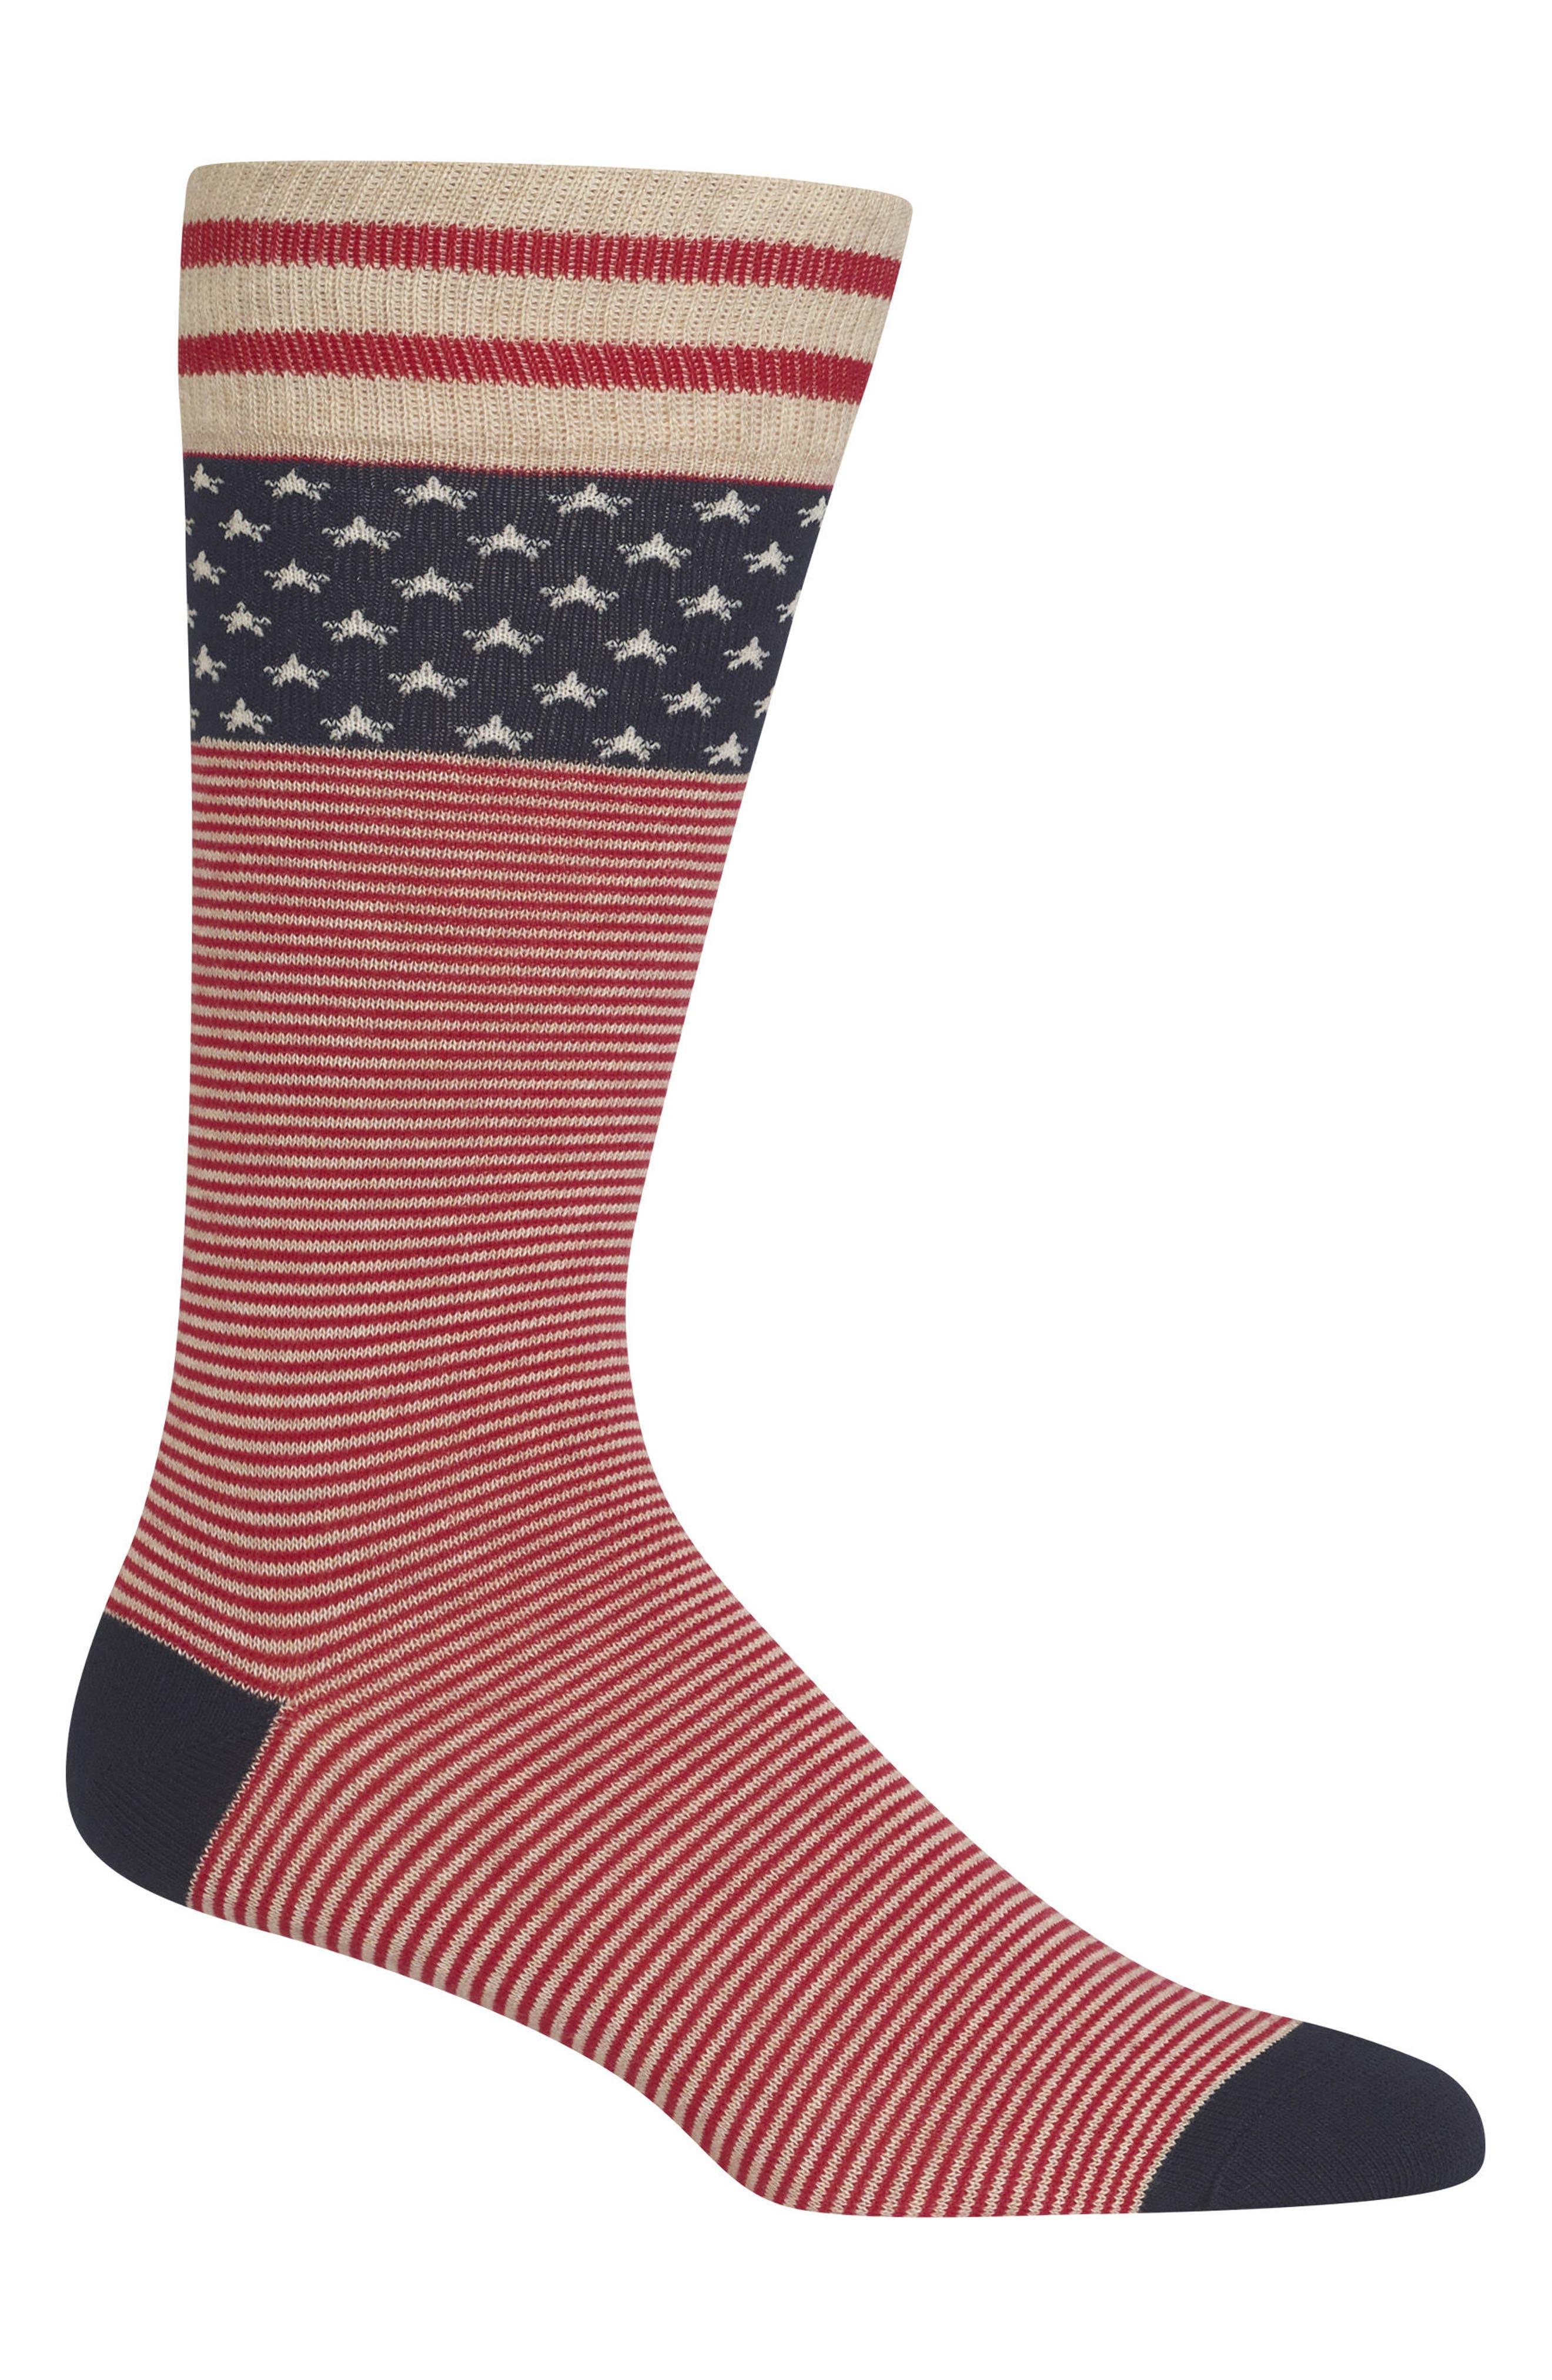 Ralph Lauren American Flag Socks,                         Main,                         color, Oatmeal Heather/ Red/ Navy